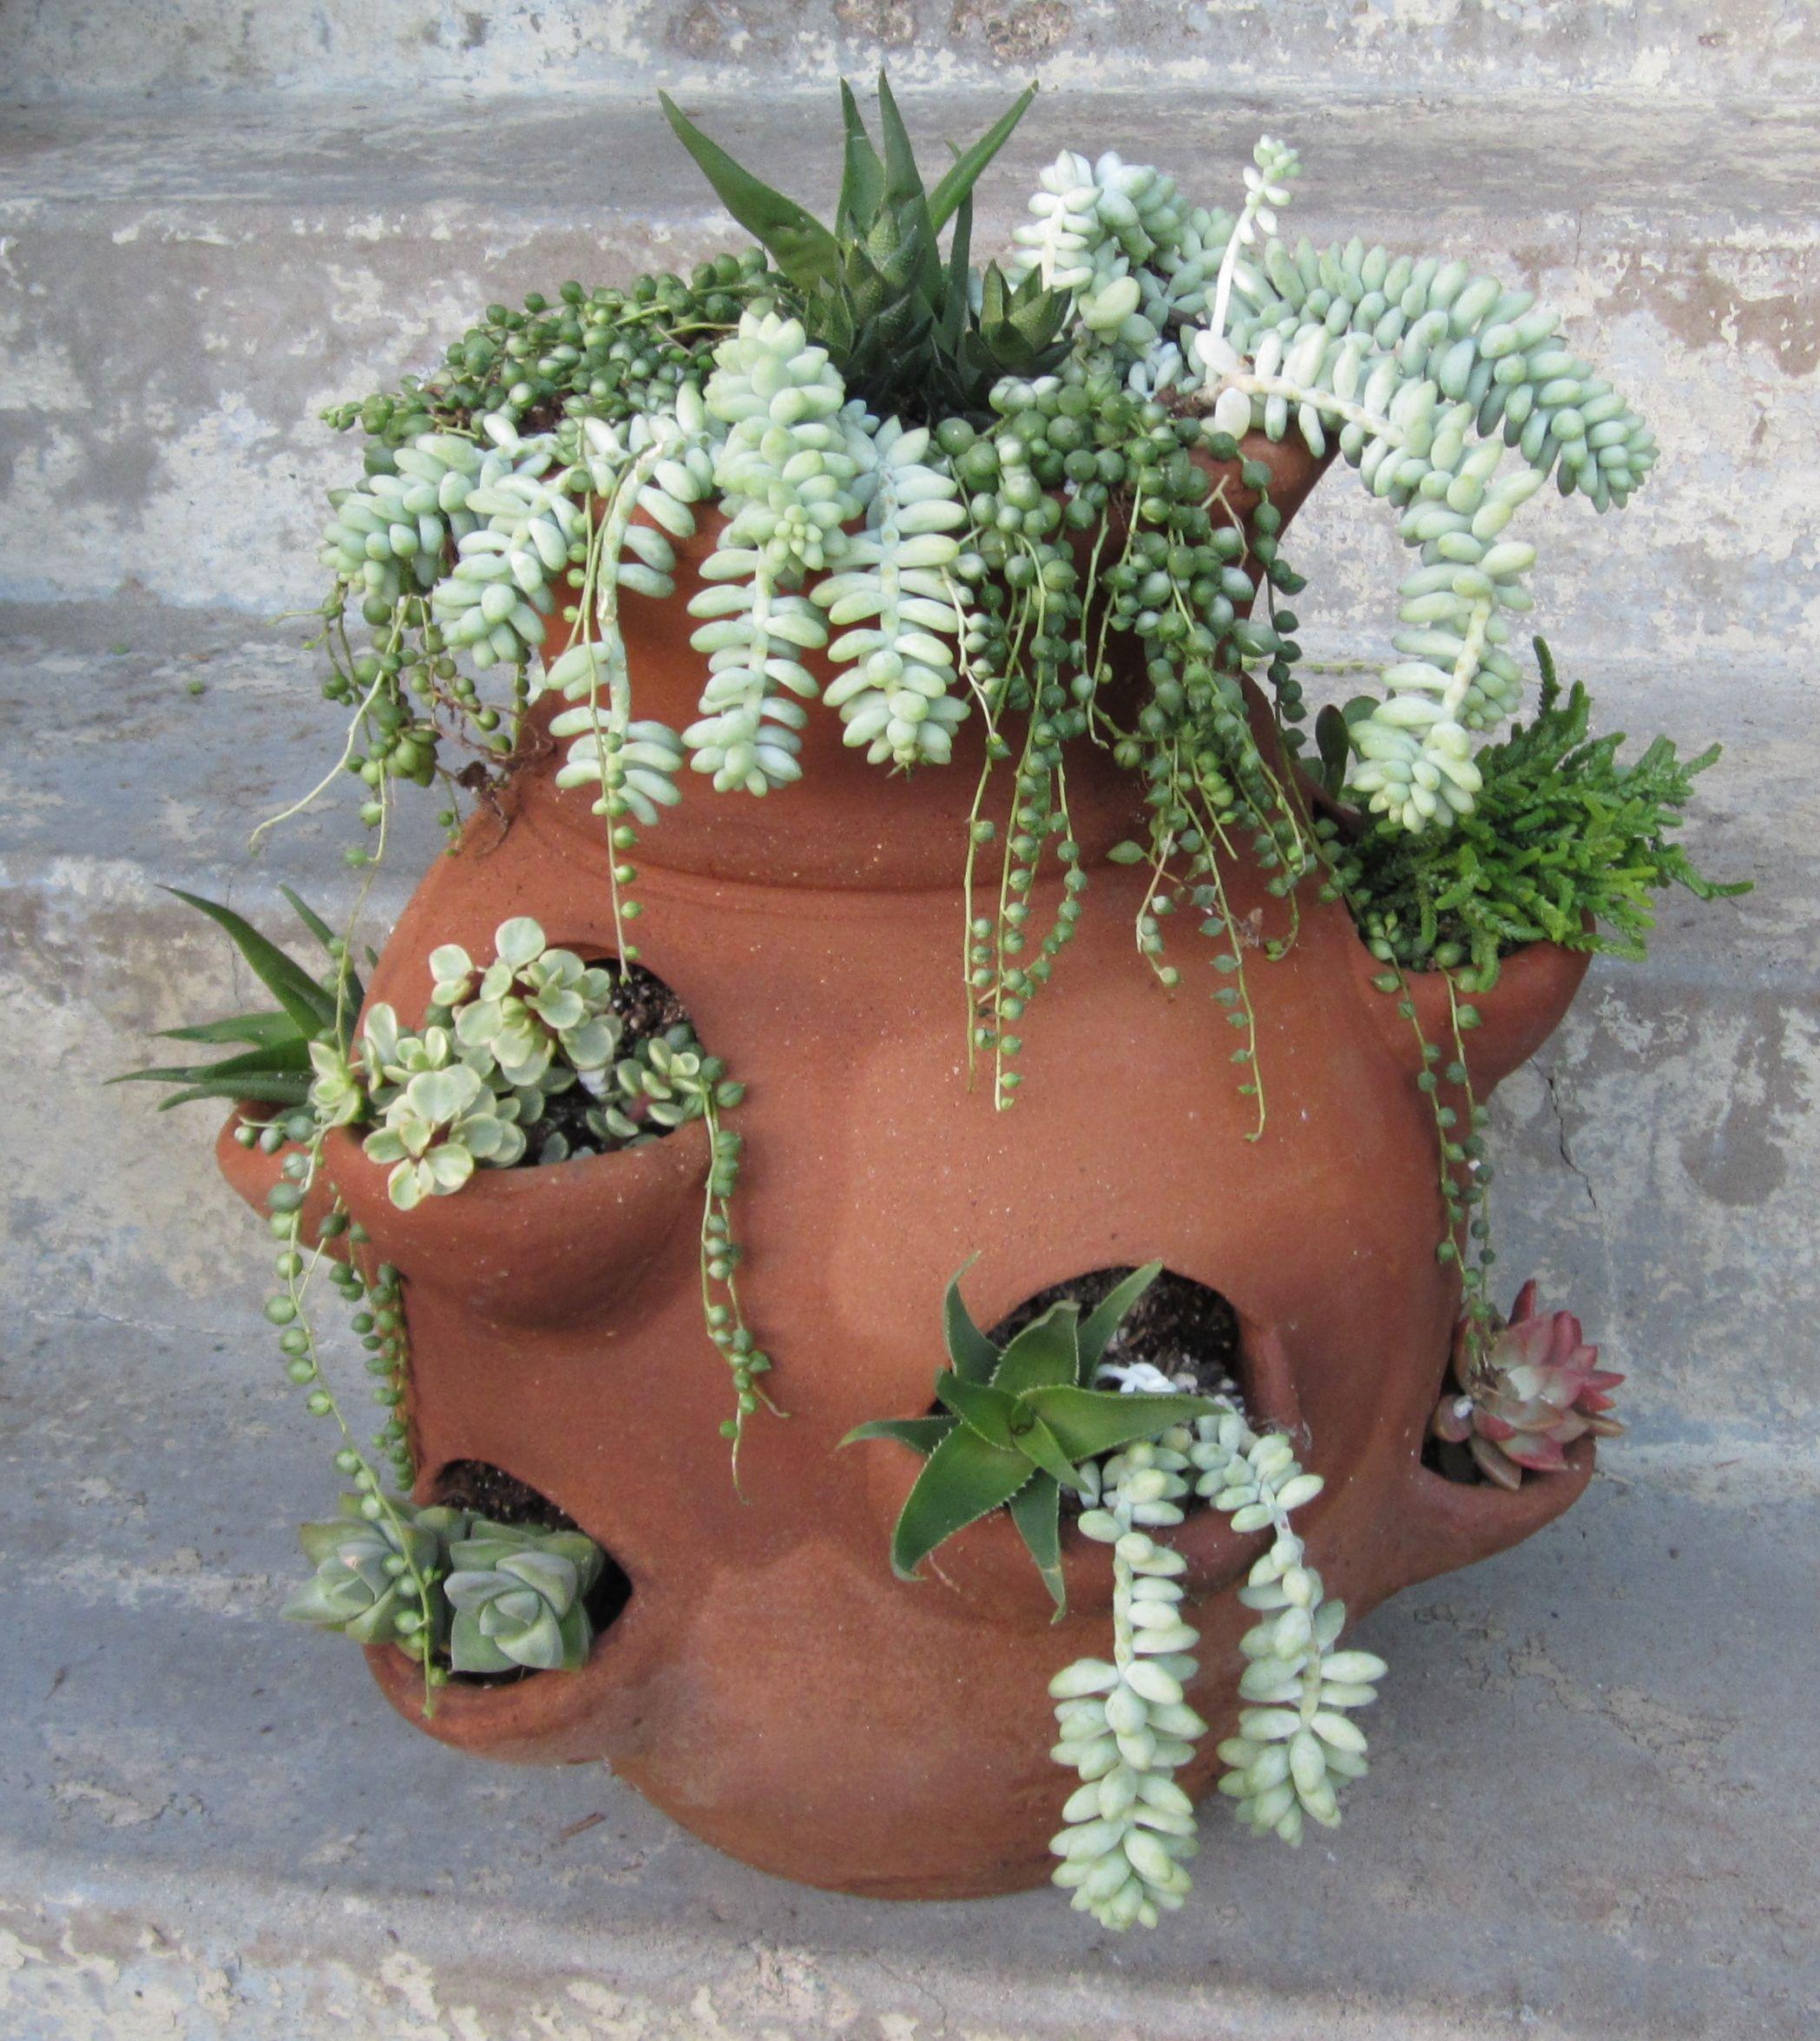 Succulents in an old strawberry pot plante succulente pinterest plantes grasses - Plantes grasses en pot ...